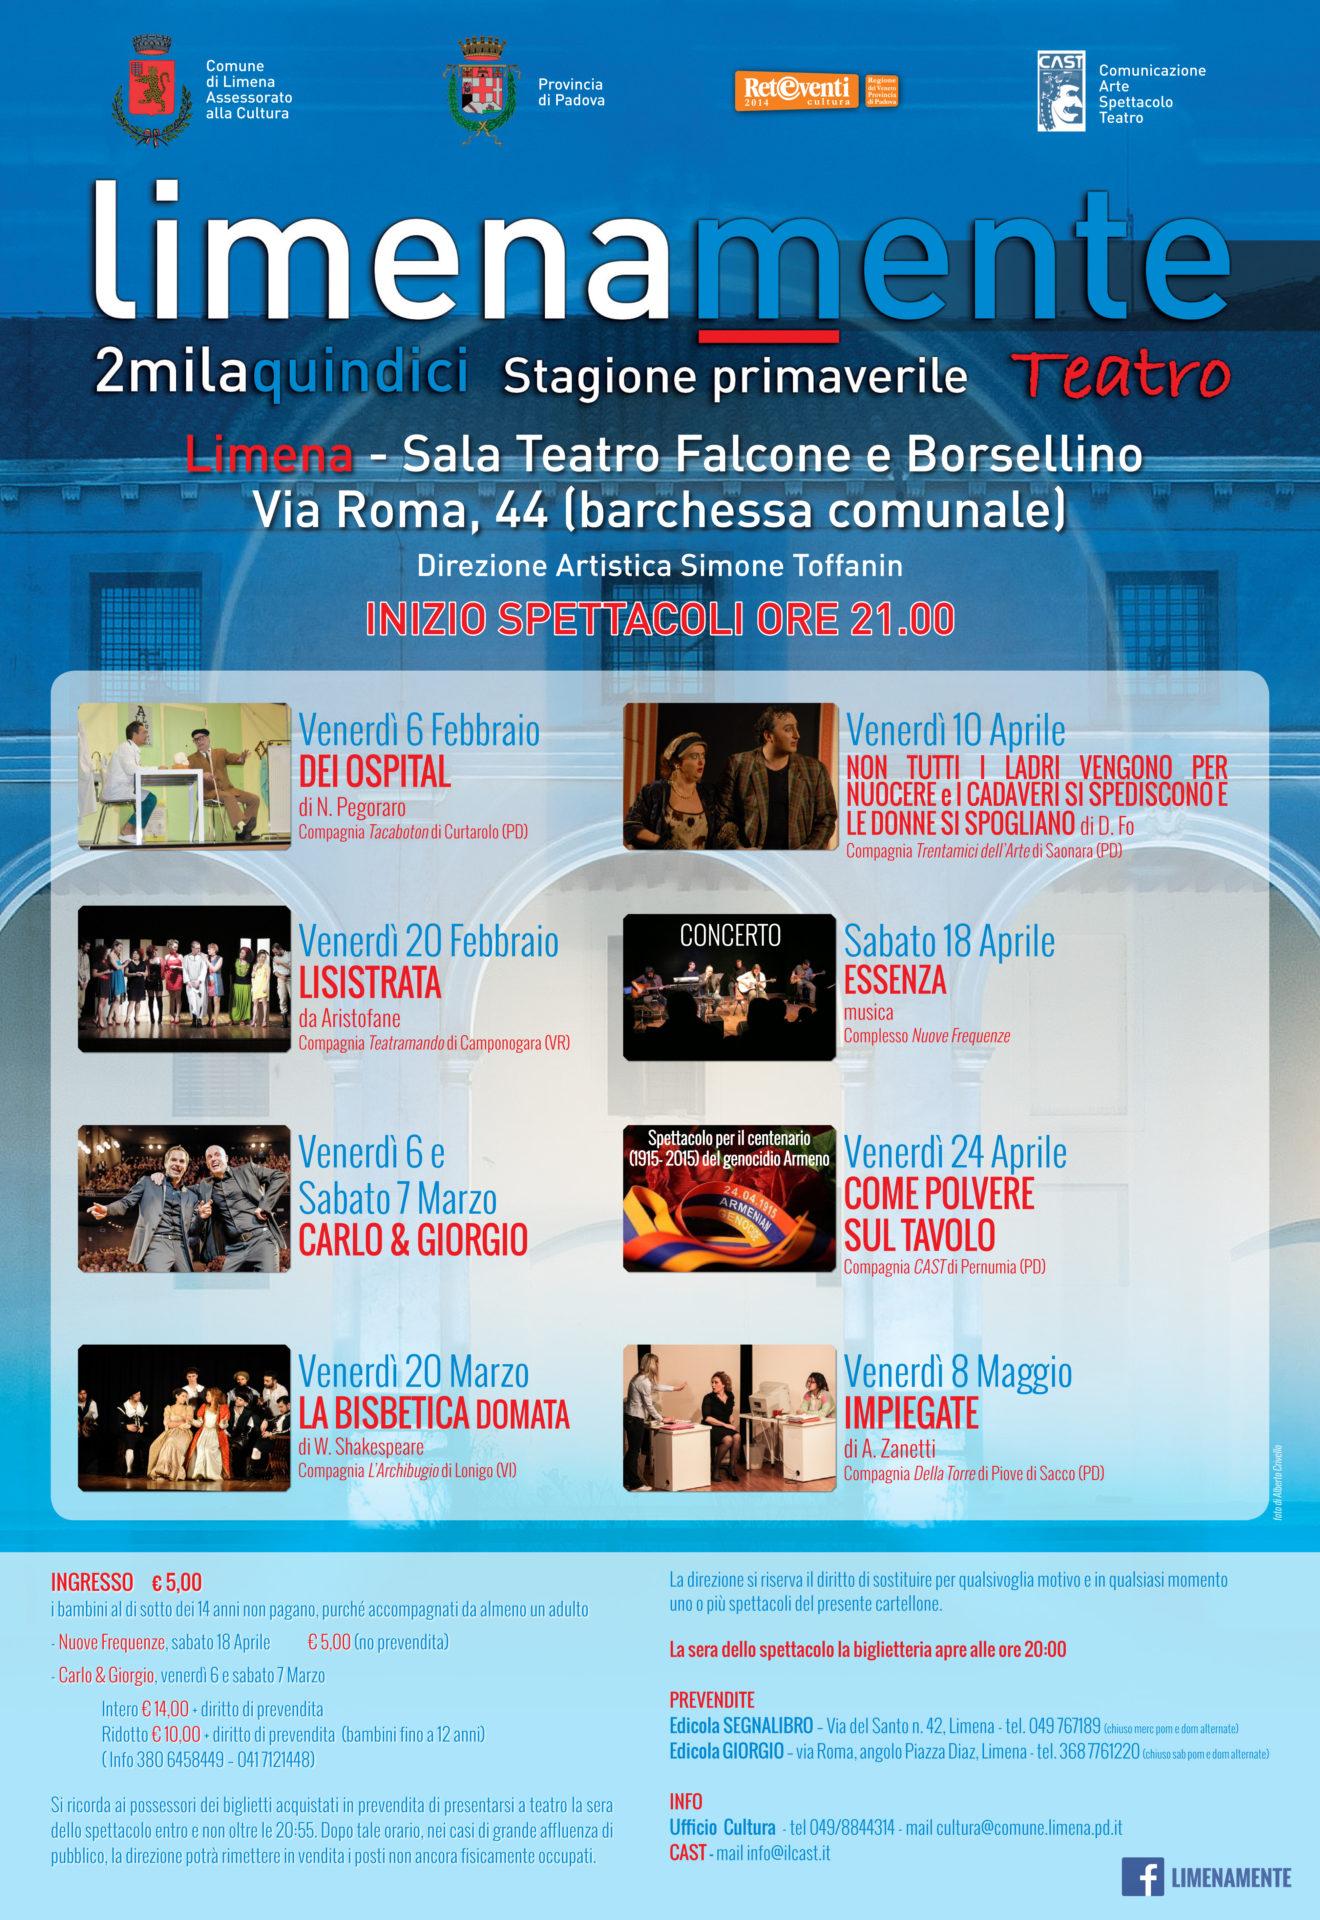 Limenamente Teatro primavera 2015